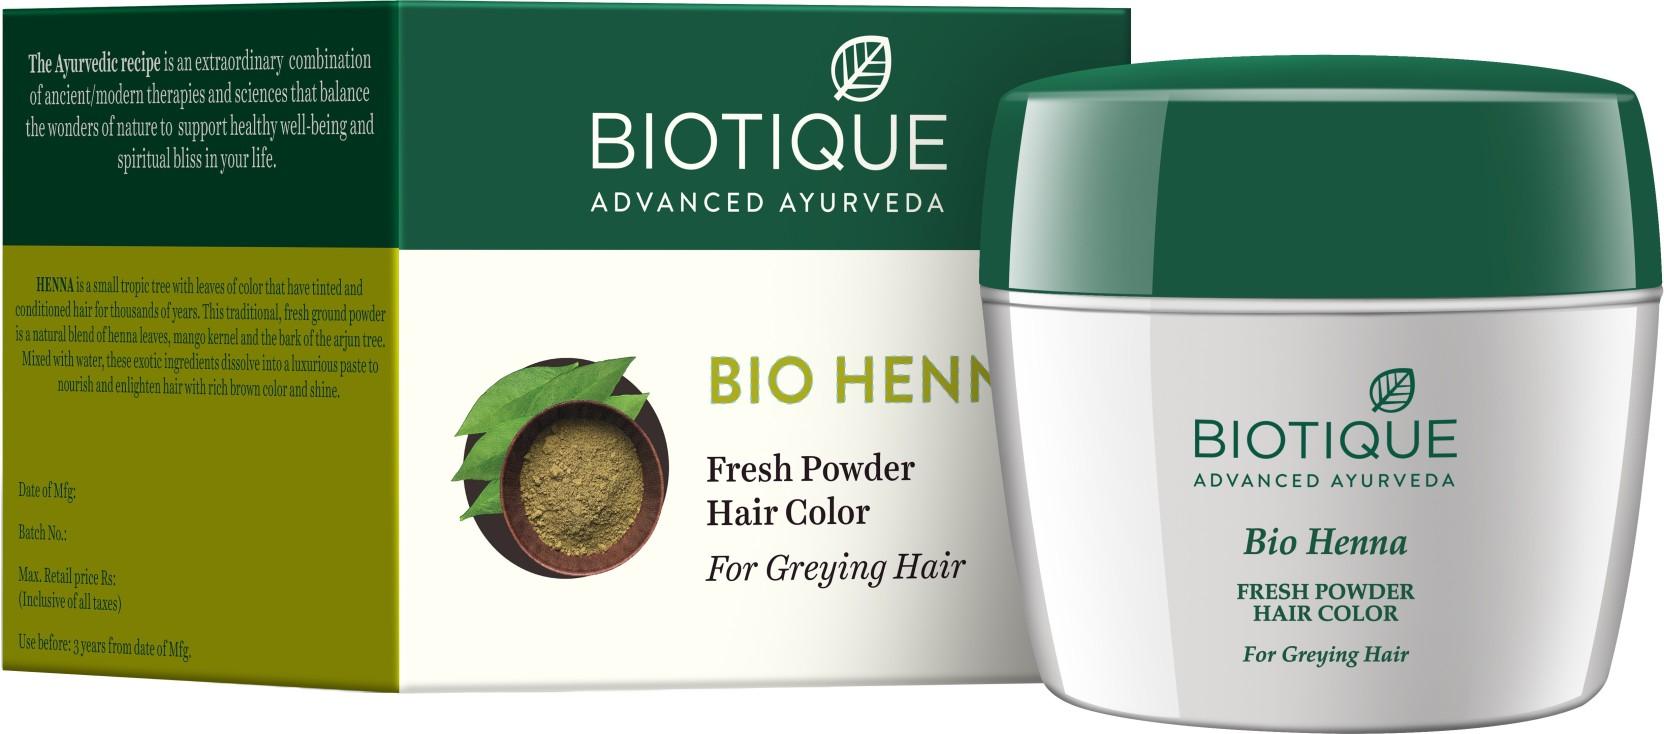 Biotique Bio Henna Fresh Powder Hair Color For Greying Hair Price